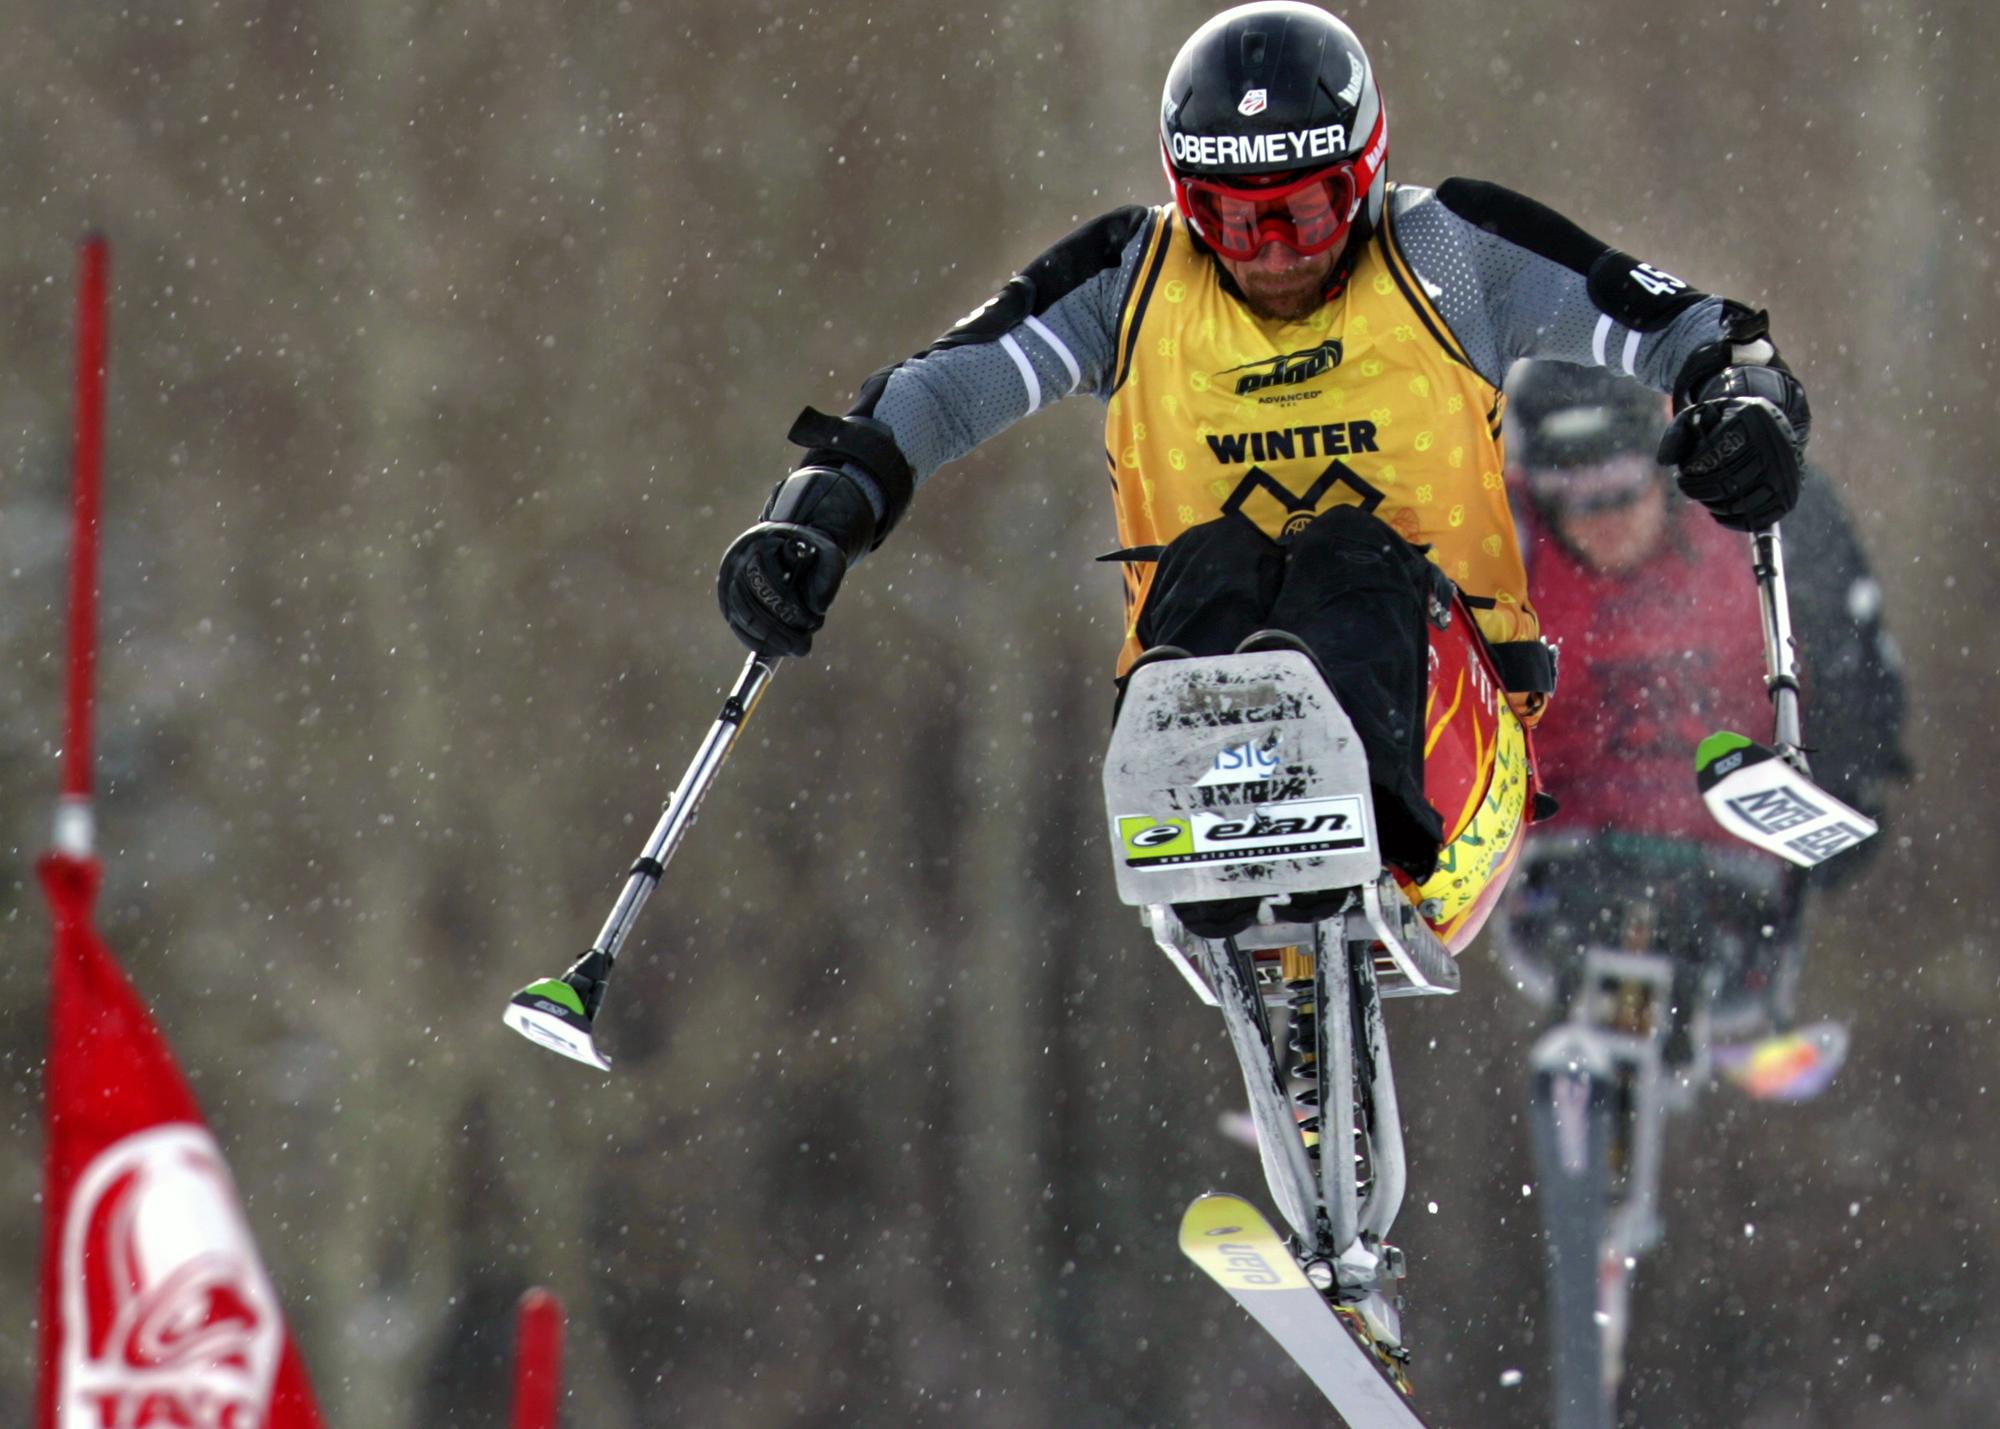 Skiier in air on mono-ski (© AP Images)